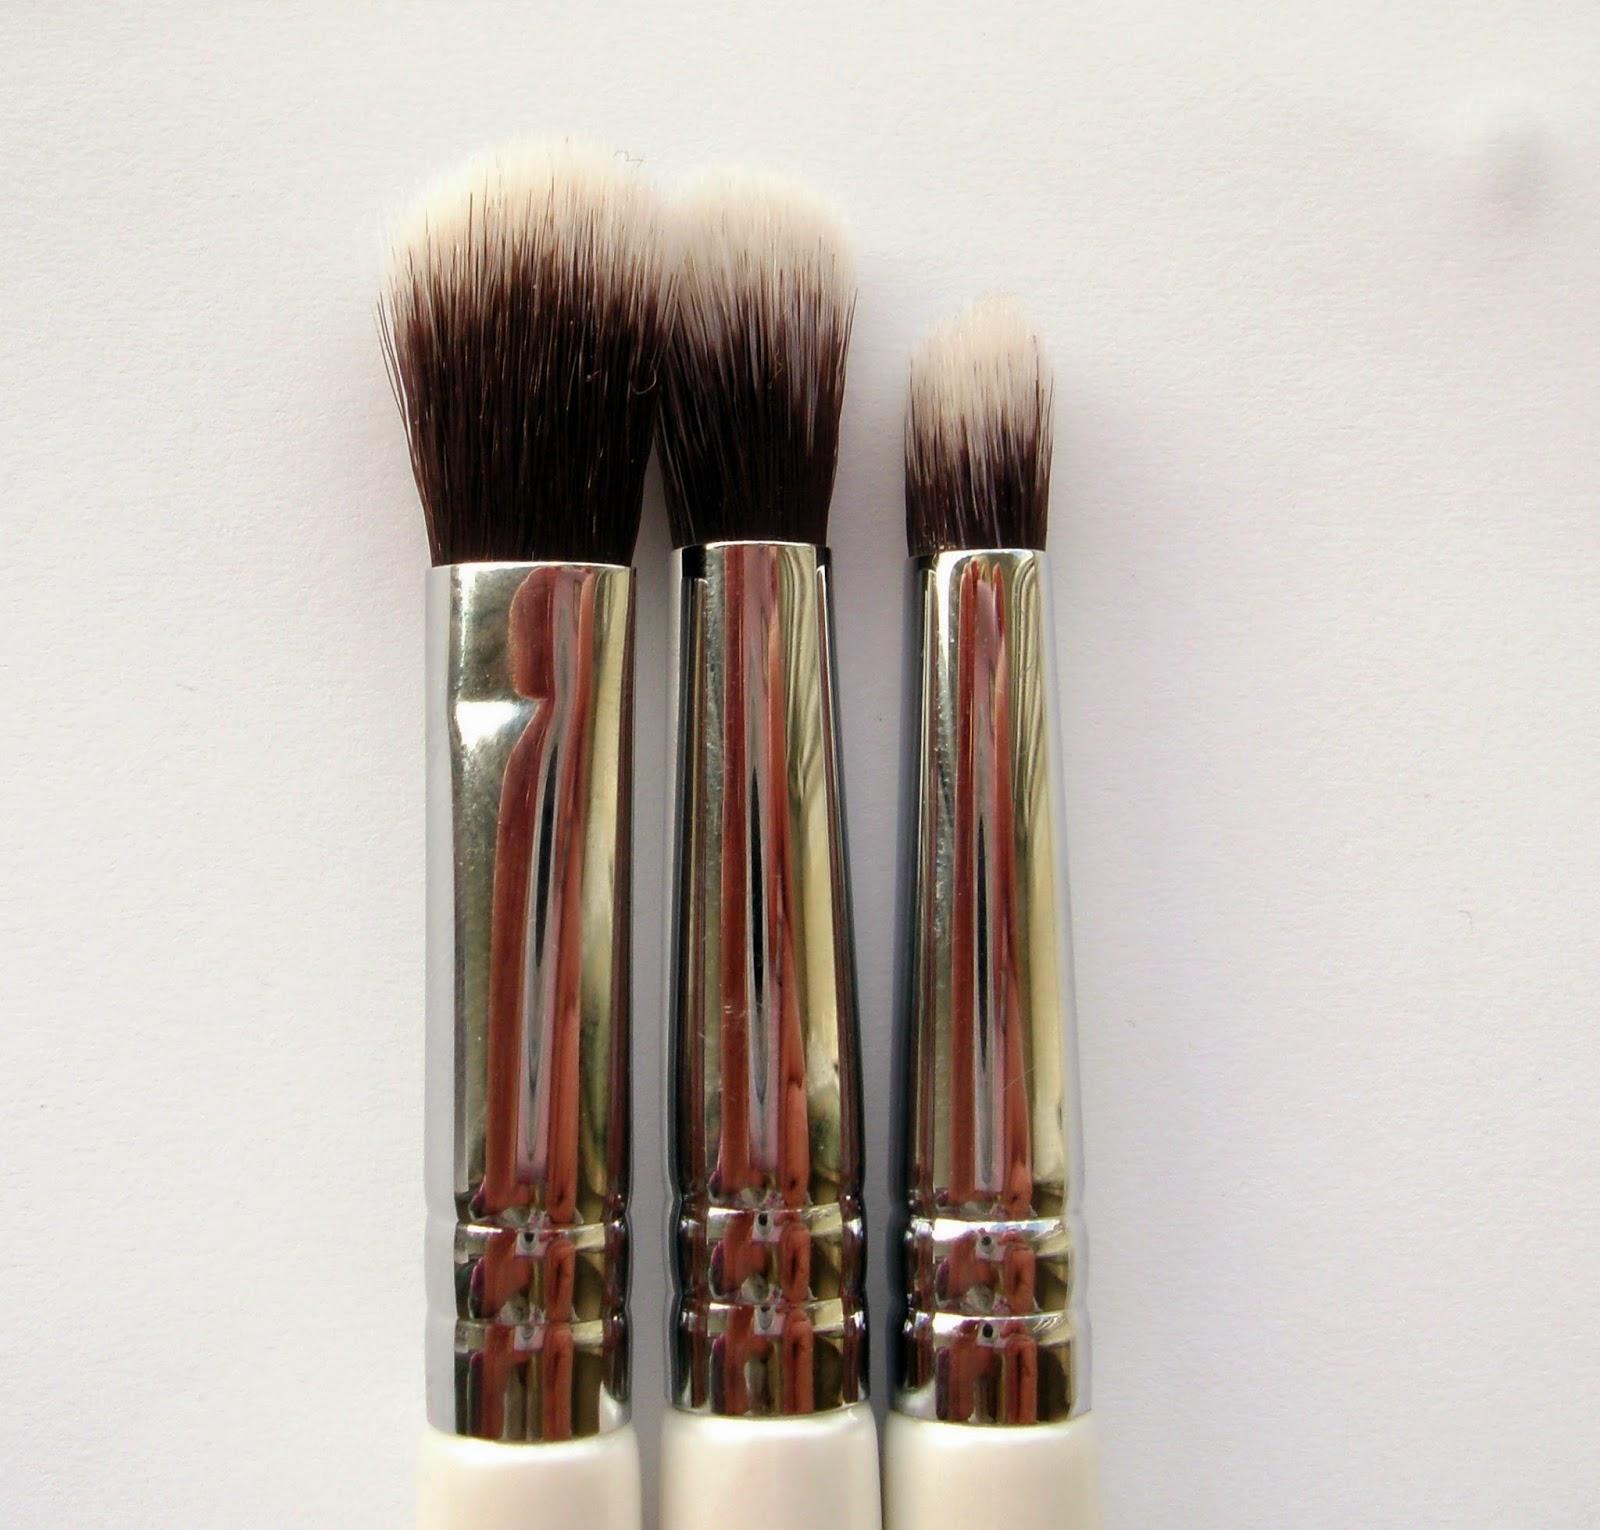 Nanshy Eye Makeup Brushes